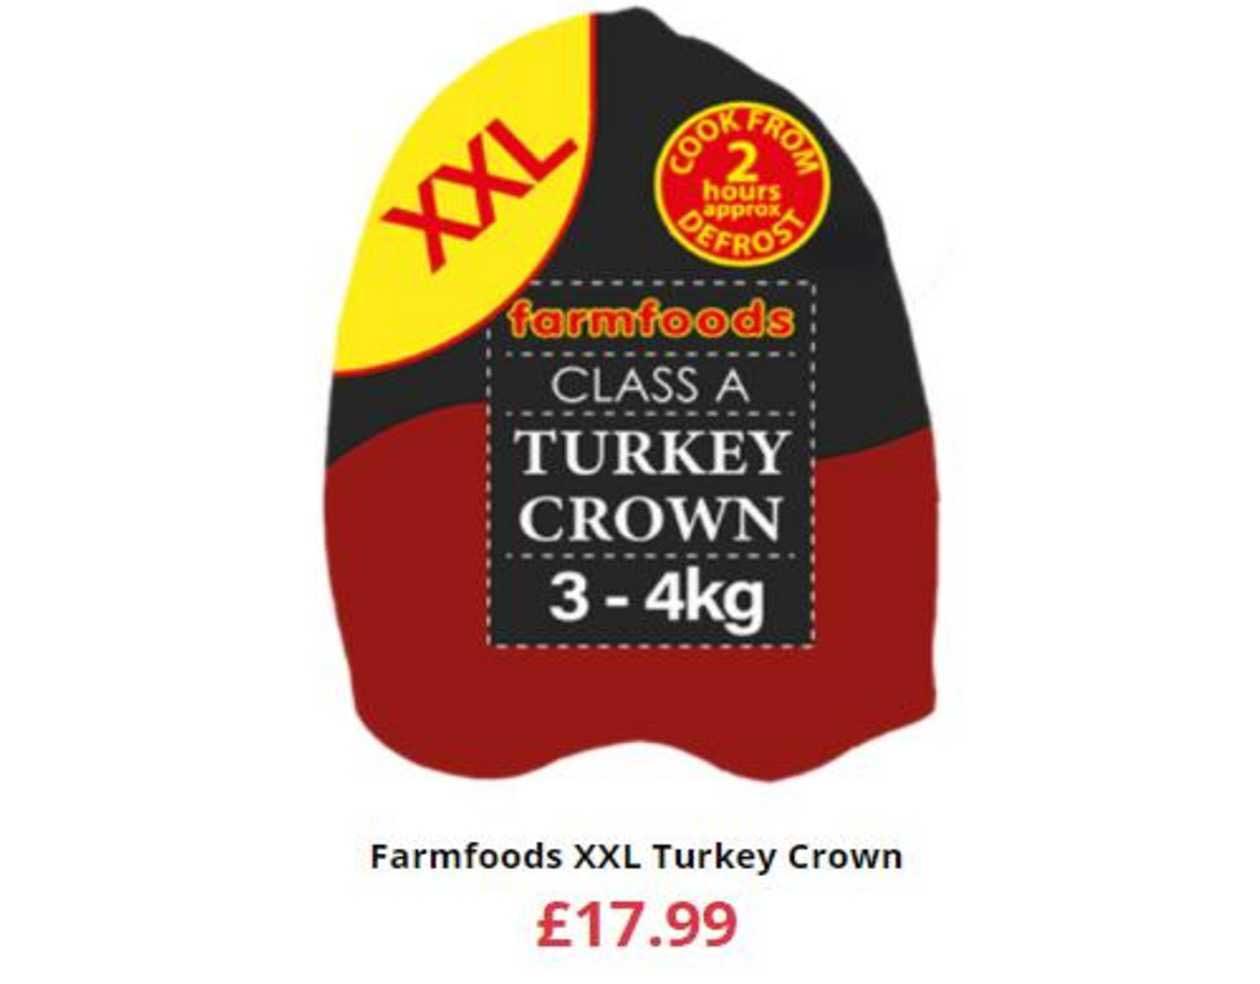 Farmfoods Farmfoods XXL Turkey Crown